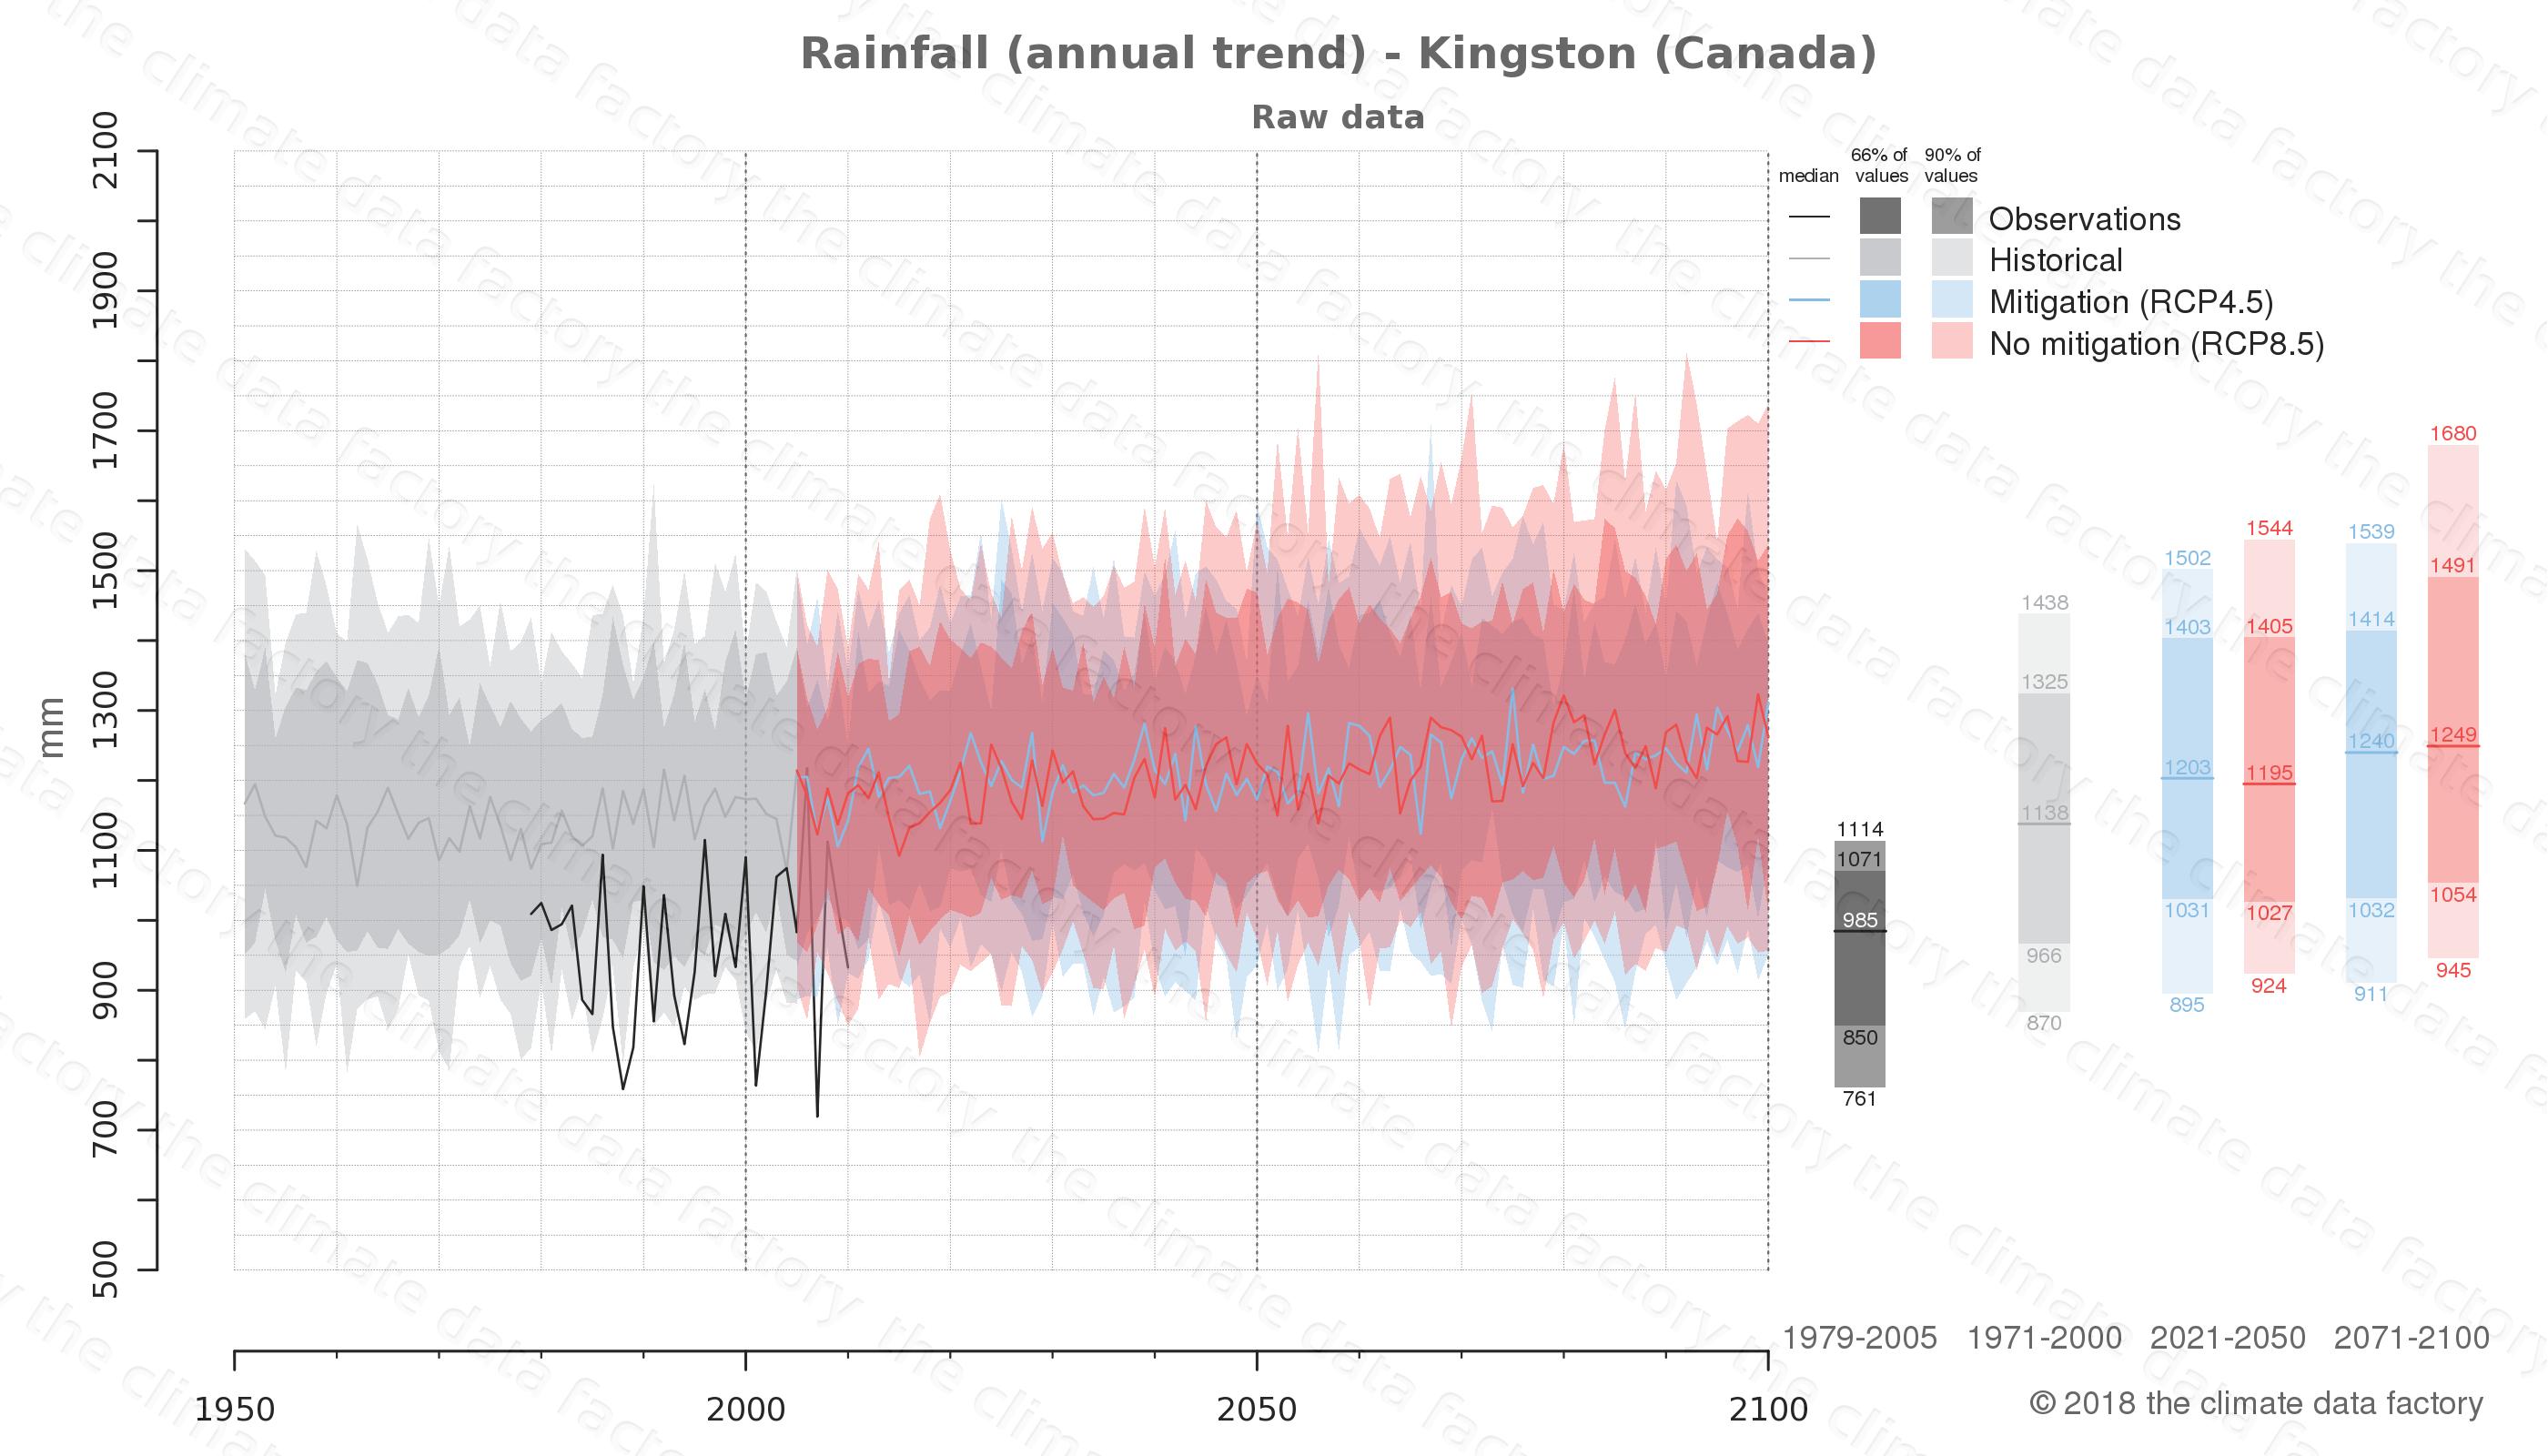 climate change data policy adaptation climate graph city data rainfall kingston canada